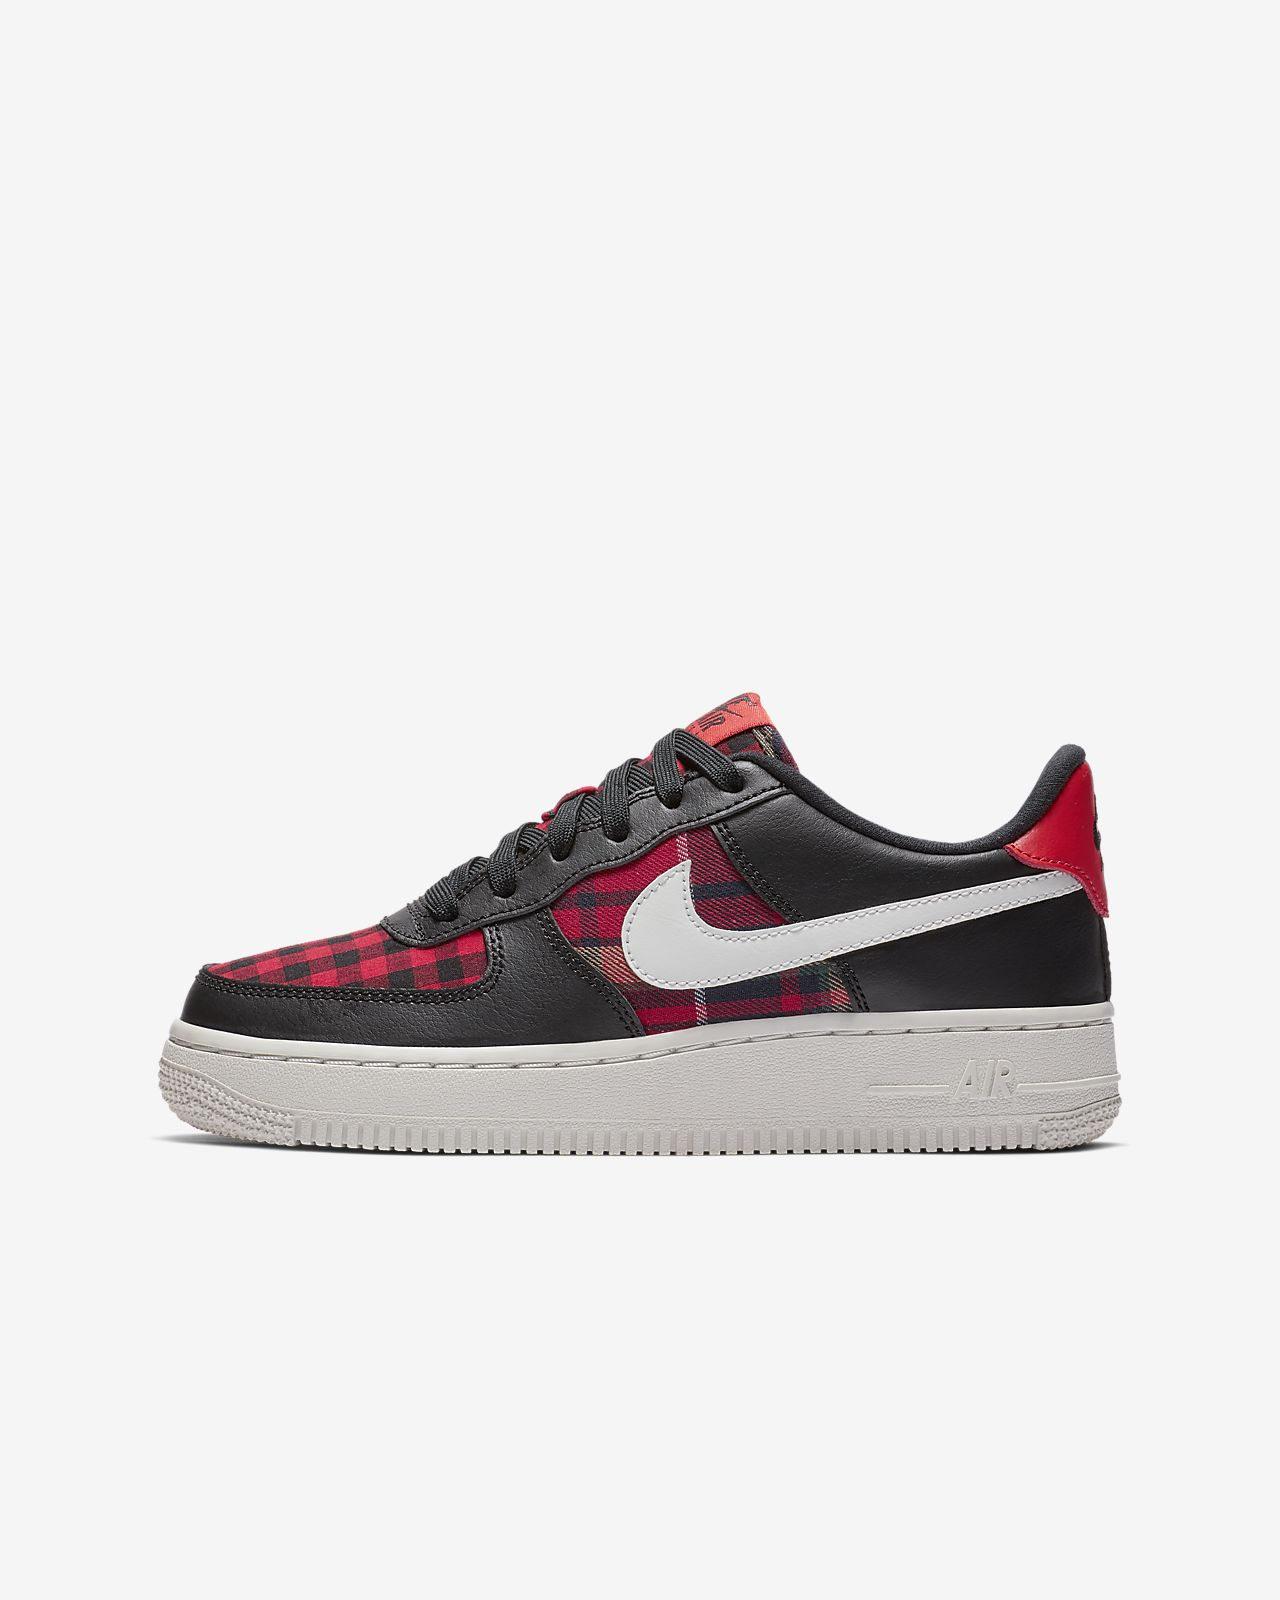 Nike Air Force 1 LV8 Shoe